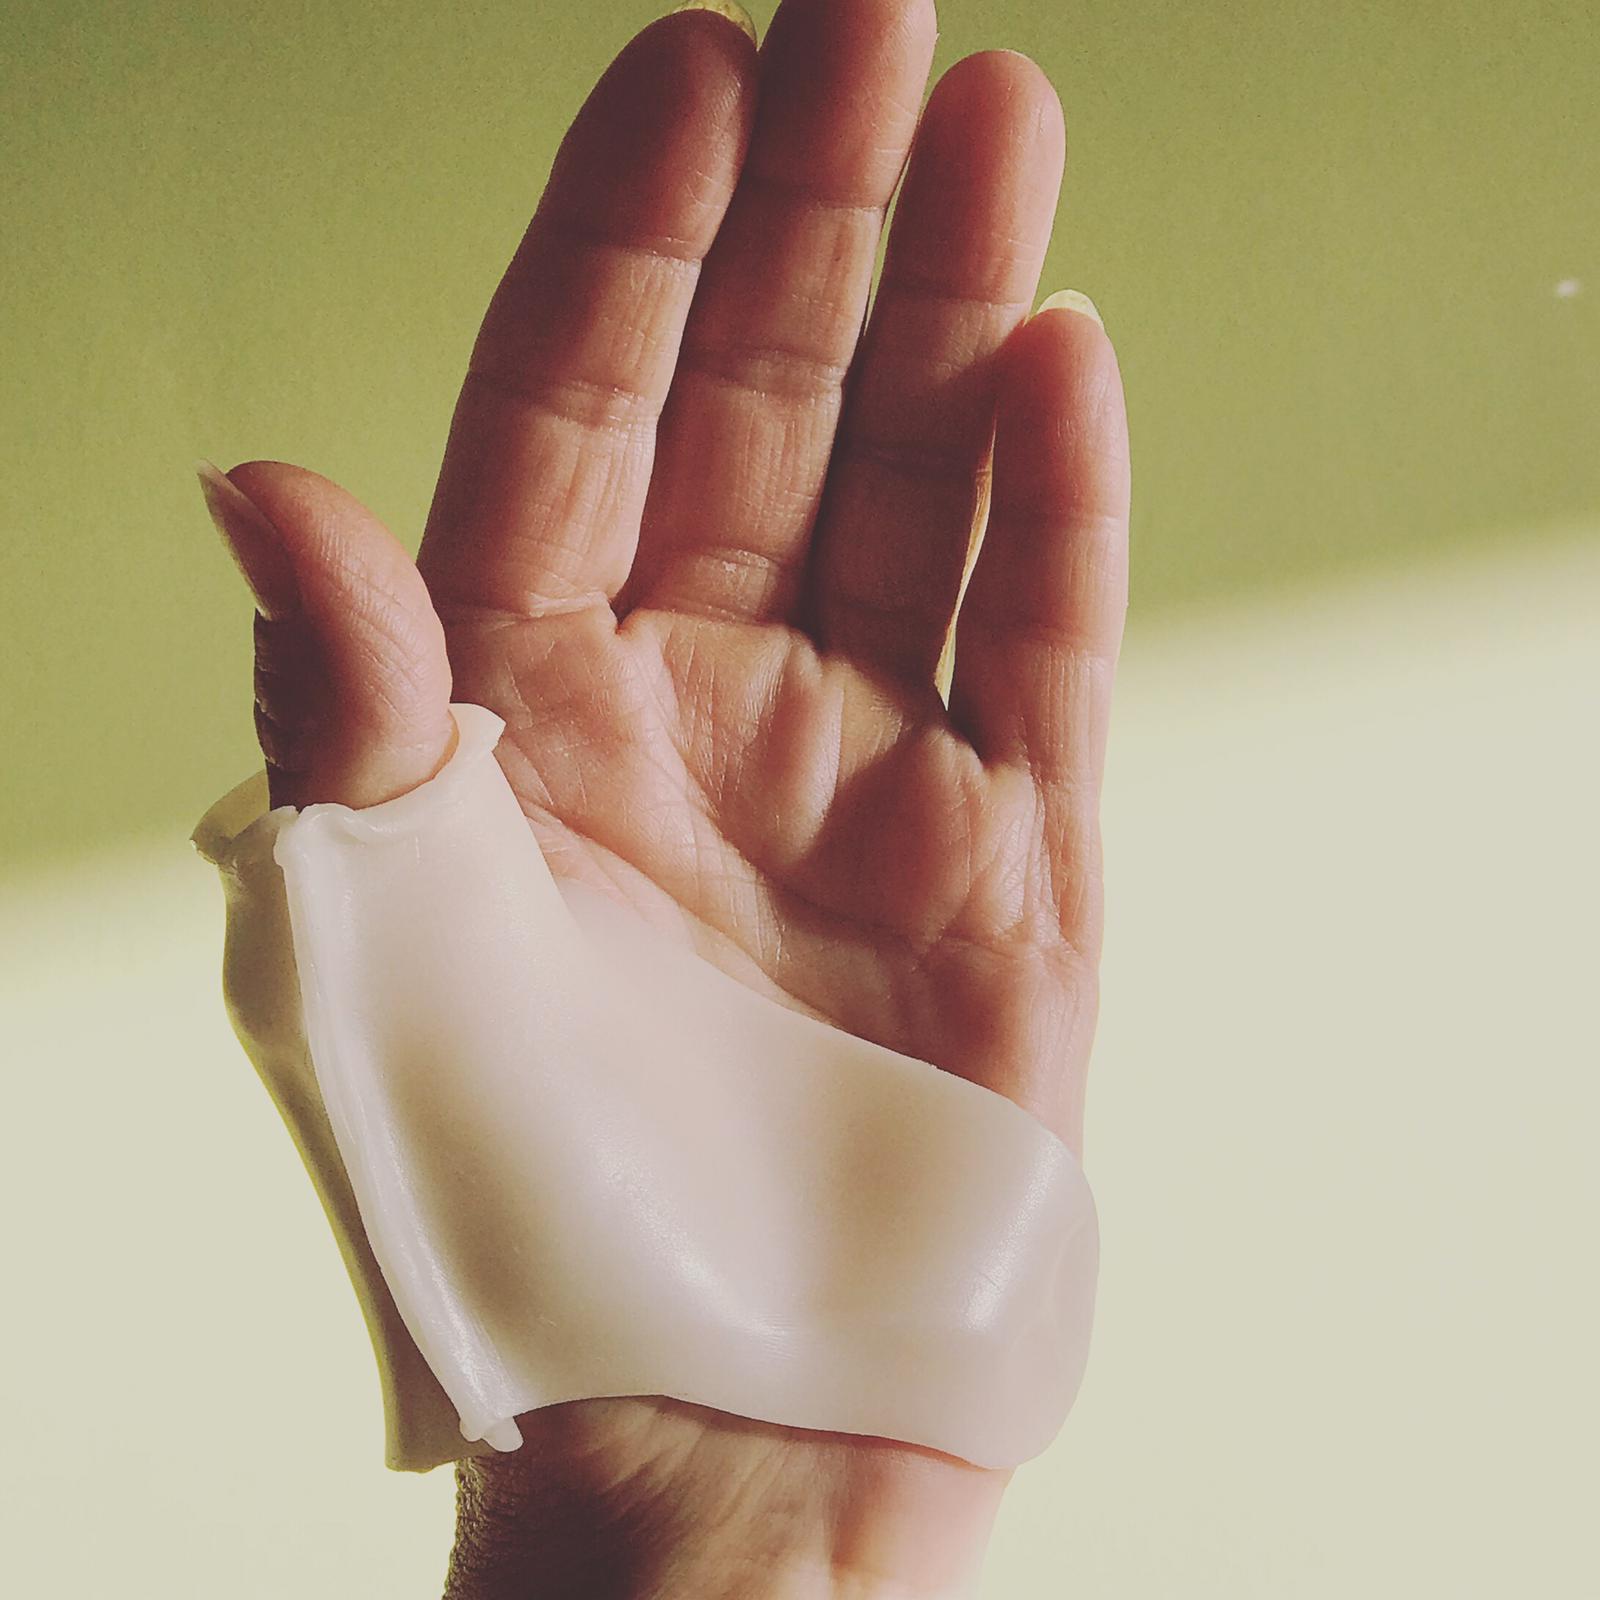 Fysio Health & Sport hand-brace